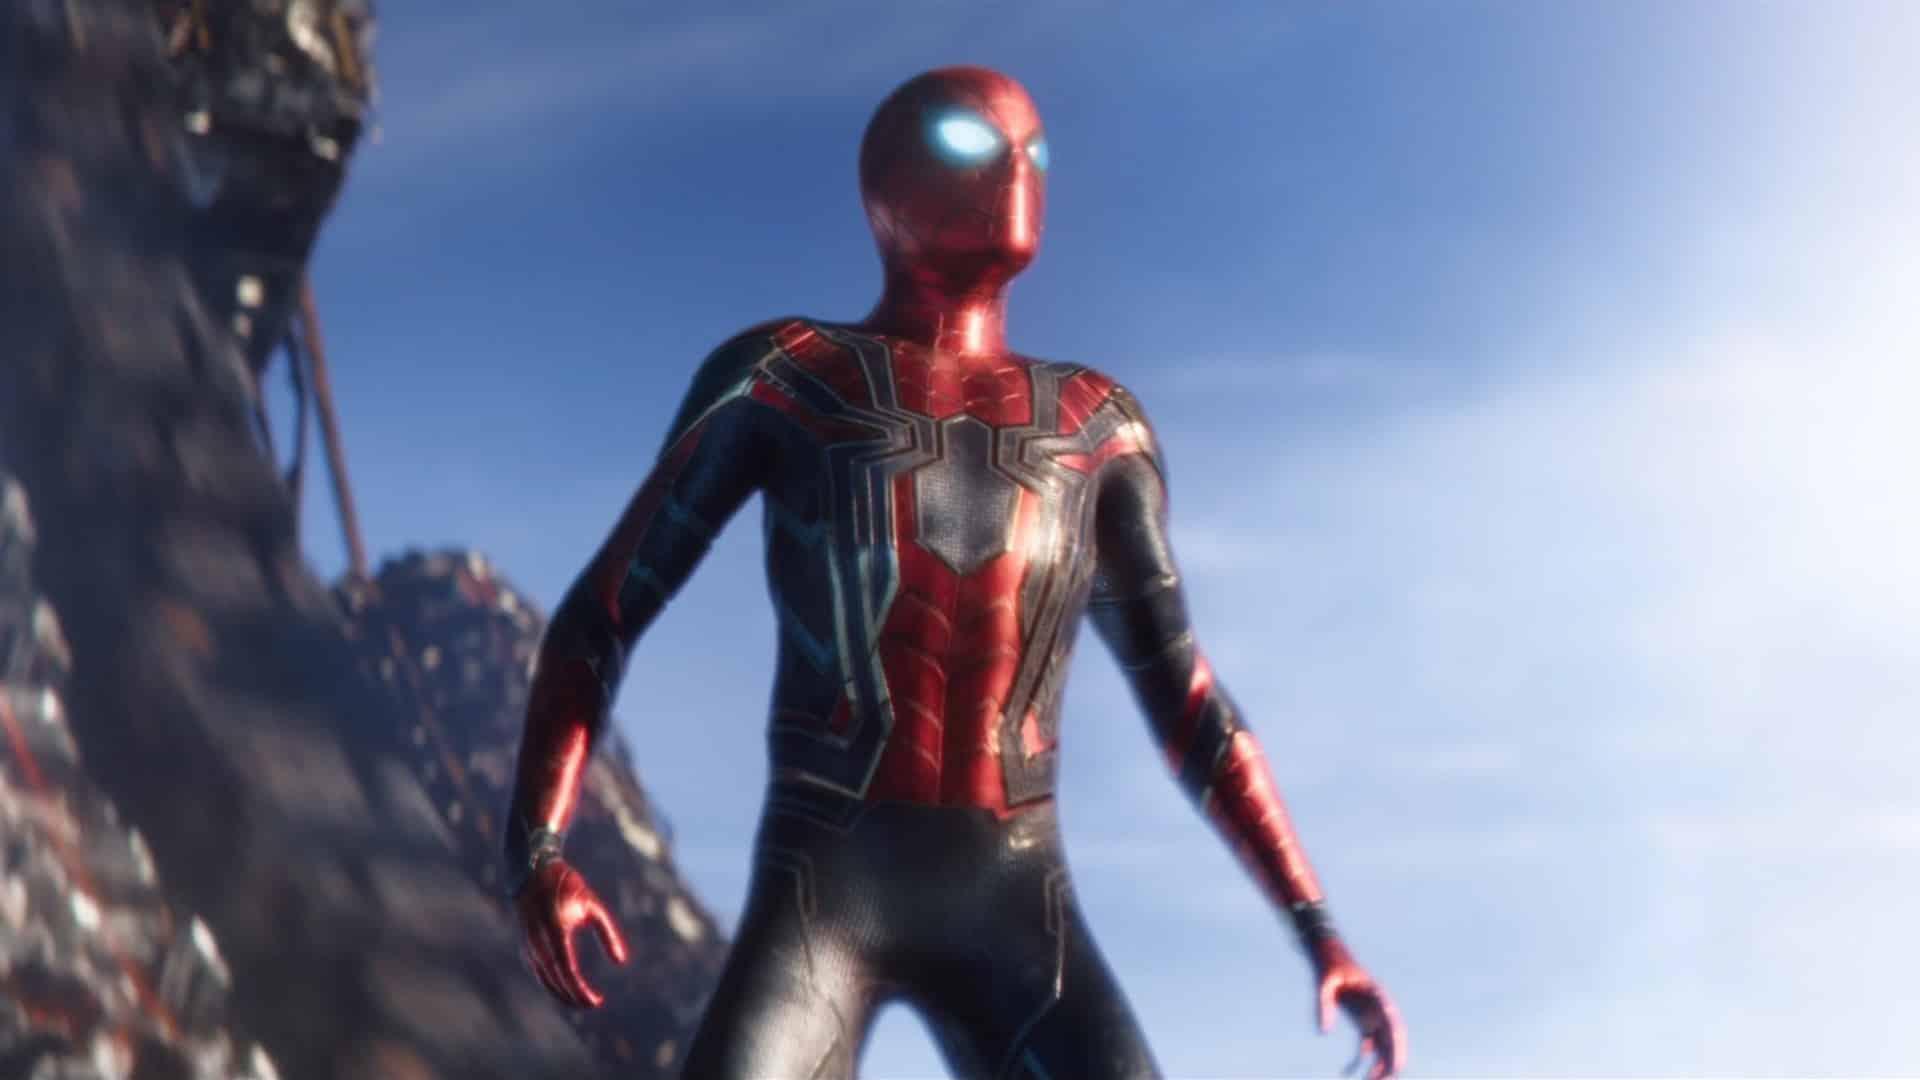 spider-man pokračovanie natáčanie tom holland spider-man infinity war